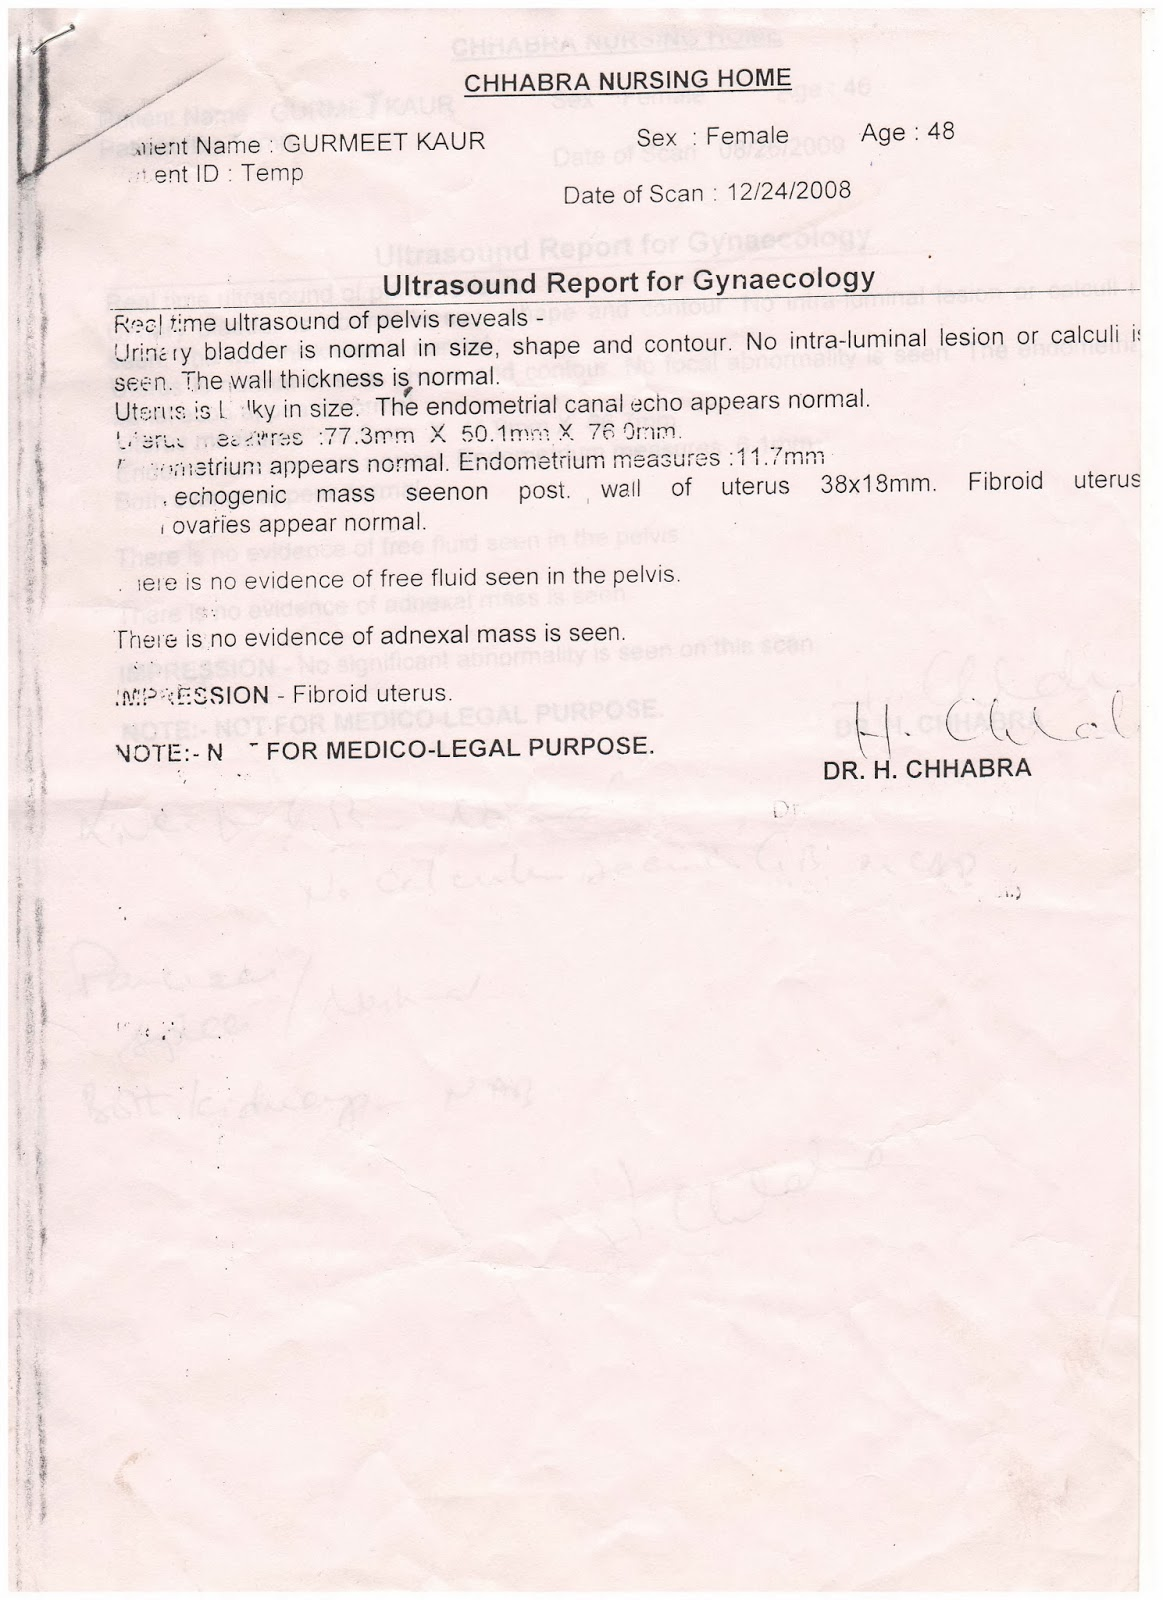 ayurvedic treatment: SUCCESS STORY OF CURE FIBROID UTERUS